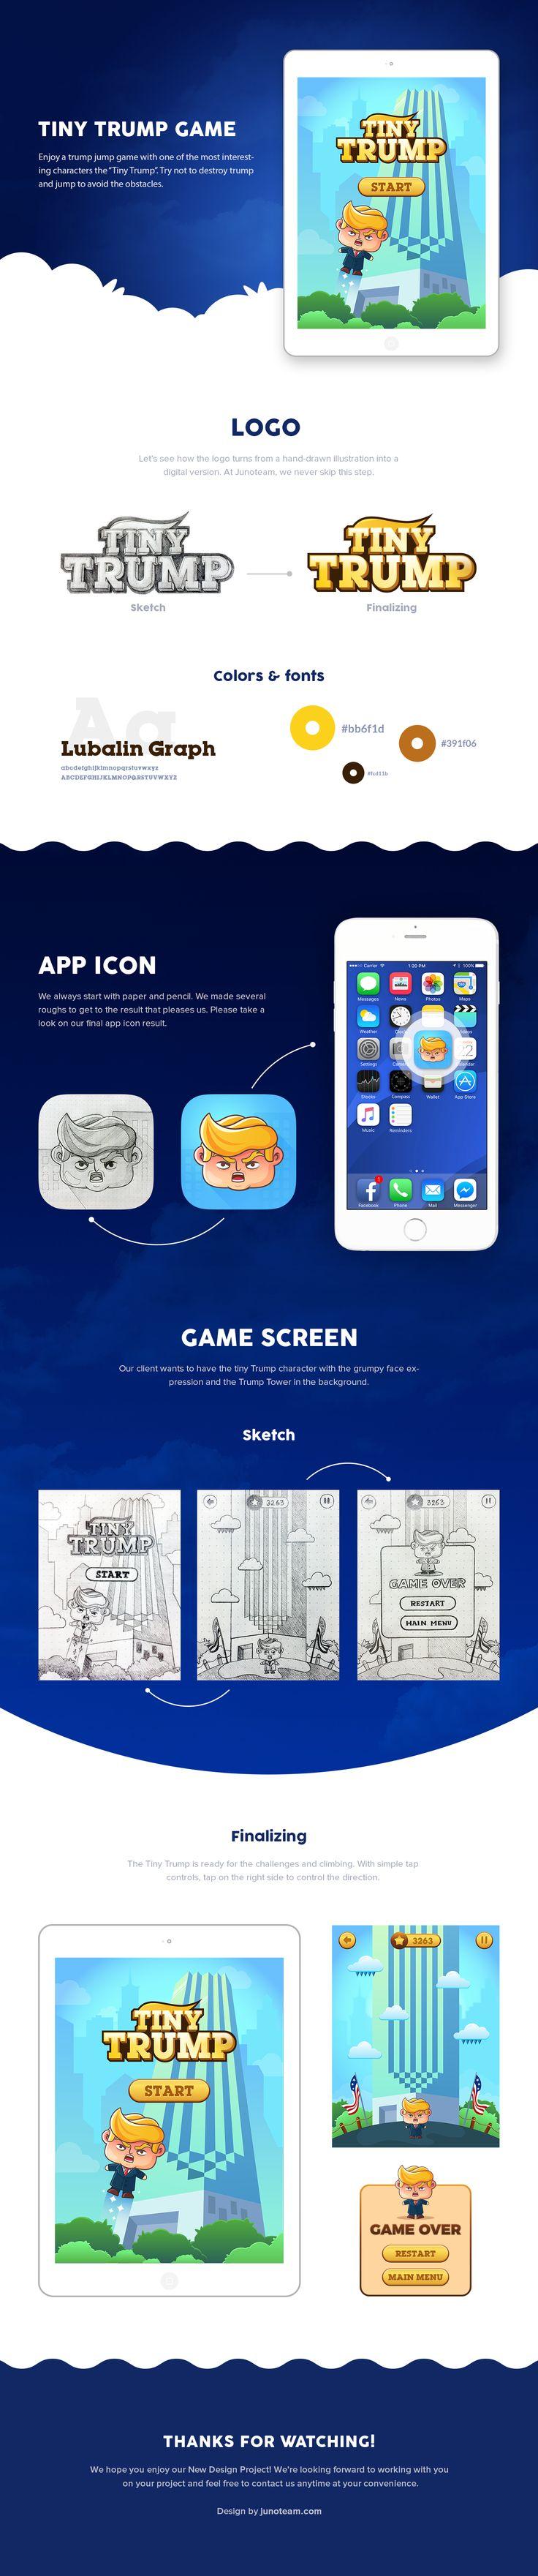 mockup screens